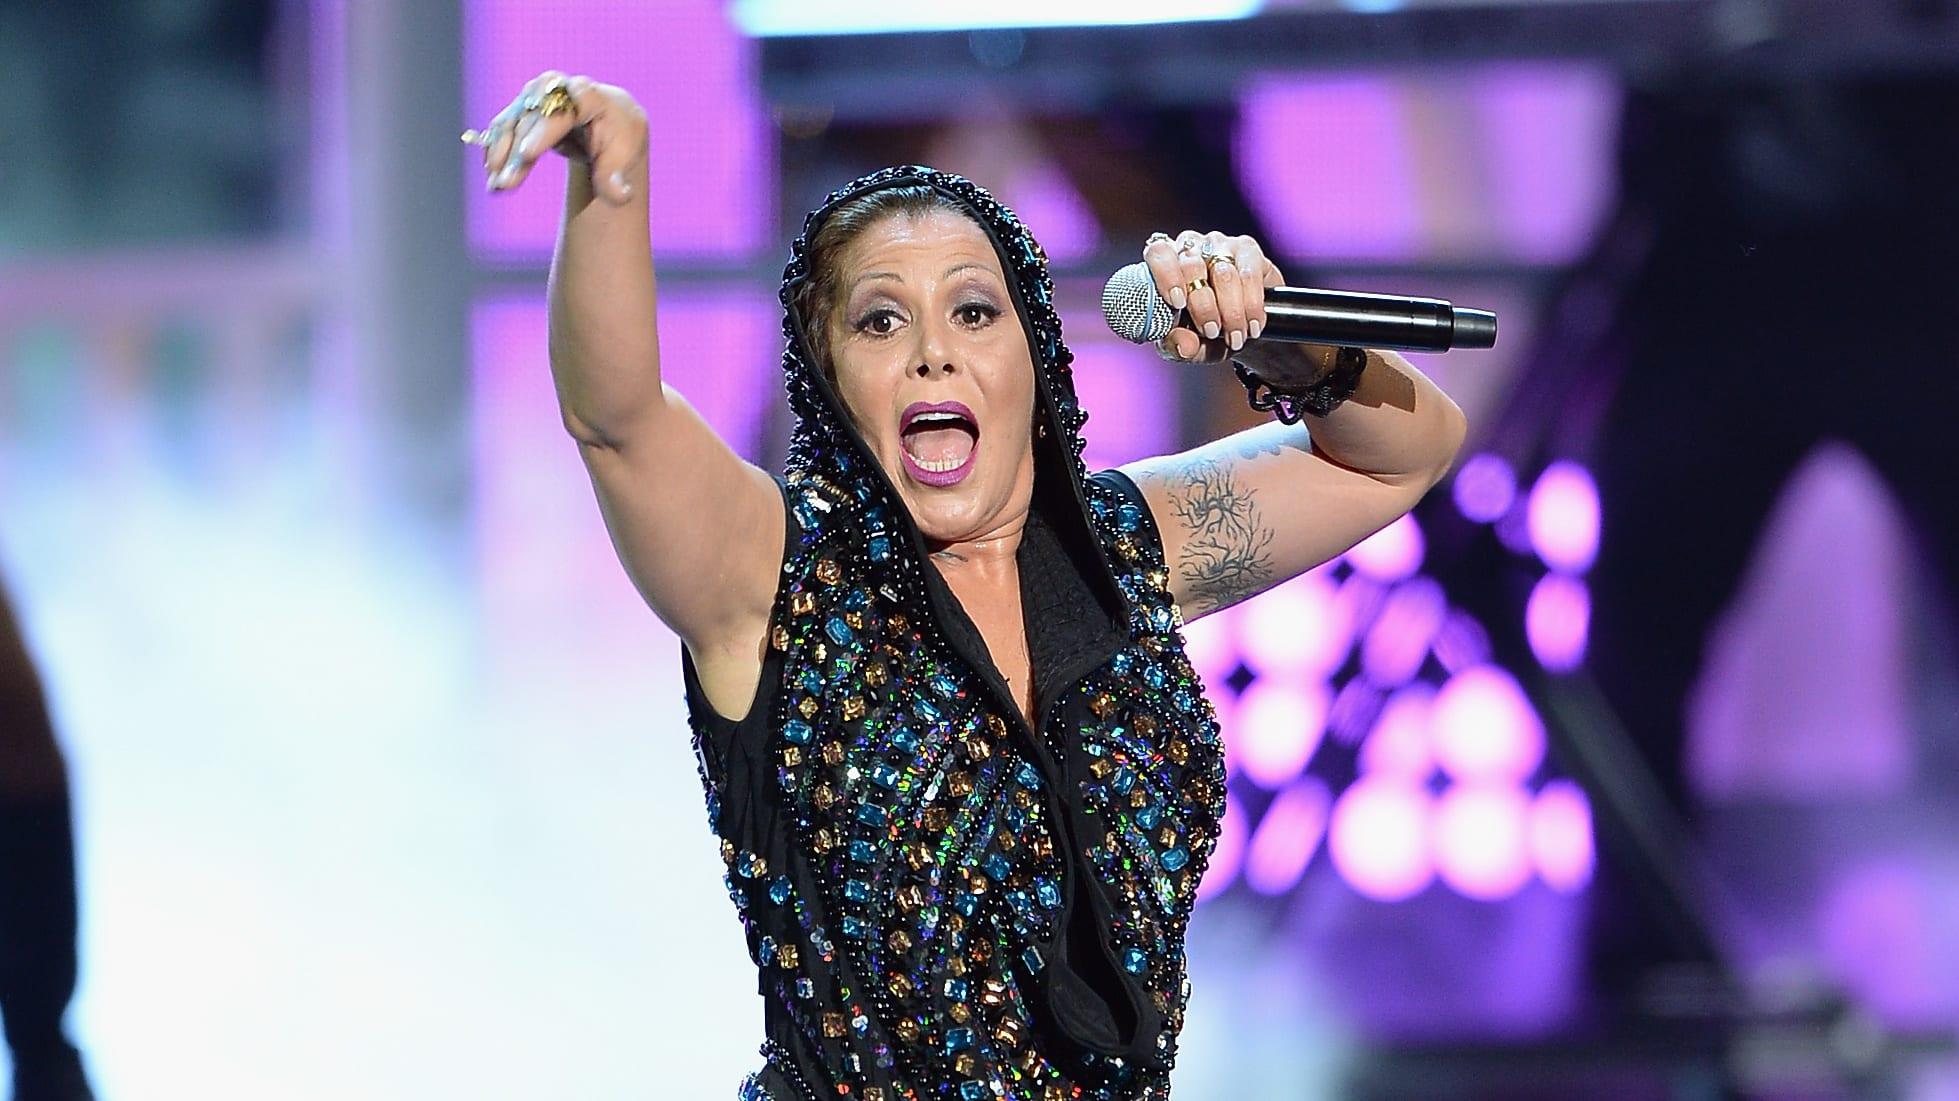 "MIAMI, FL - AUGUST 20:  Alejandra Guzman performs onstage at Telemundo's ""Premios Tu Mundo"" Awards 2015 at American Airlines Arena on August 20, 2015 in Miami, Florida.  (Photo by Rodrigo Varela/Getty Images)"